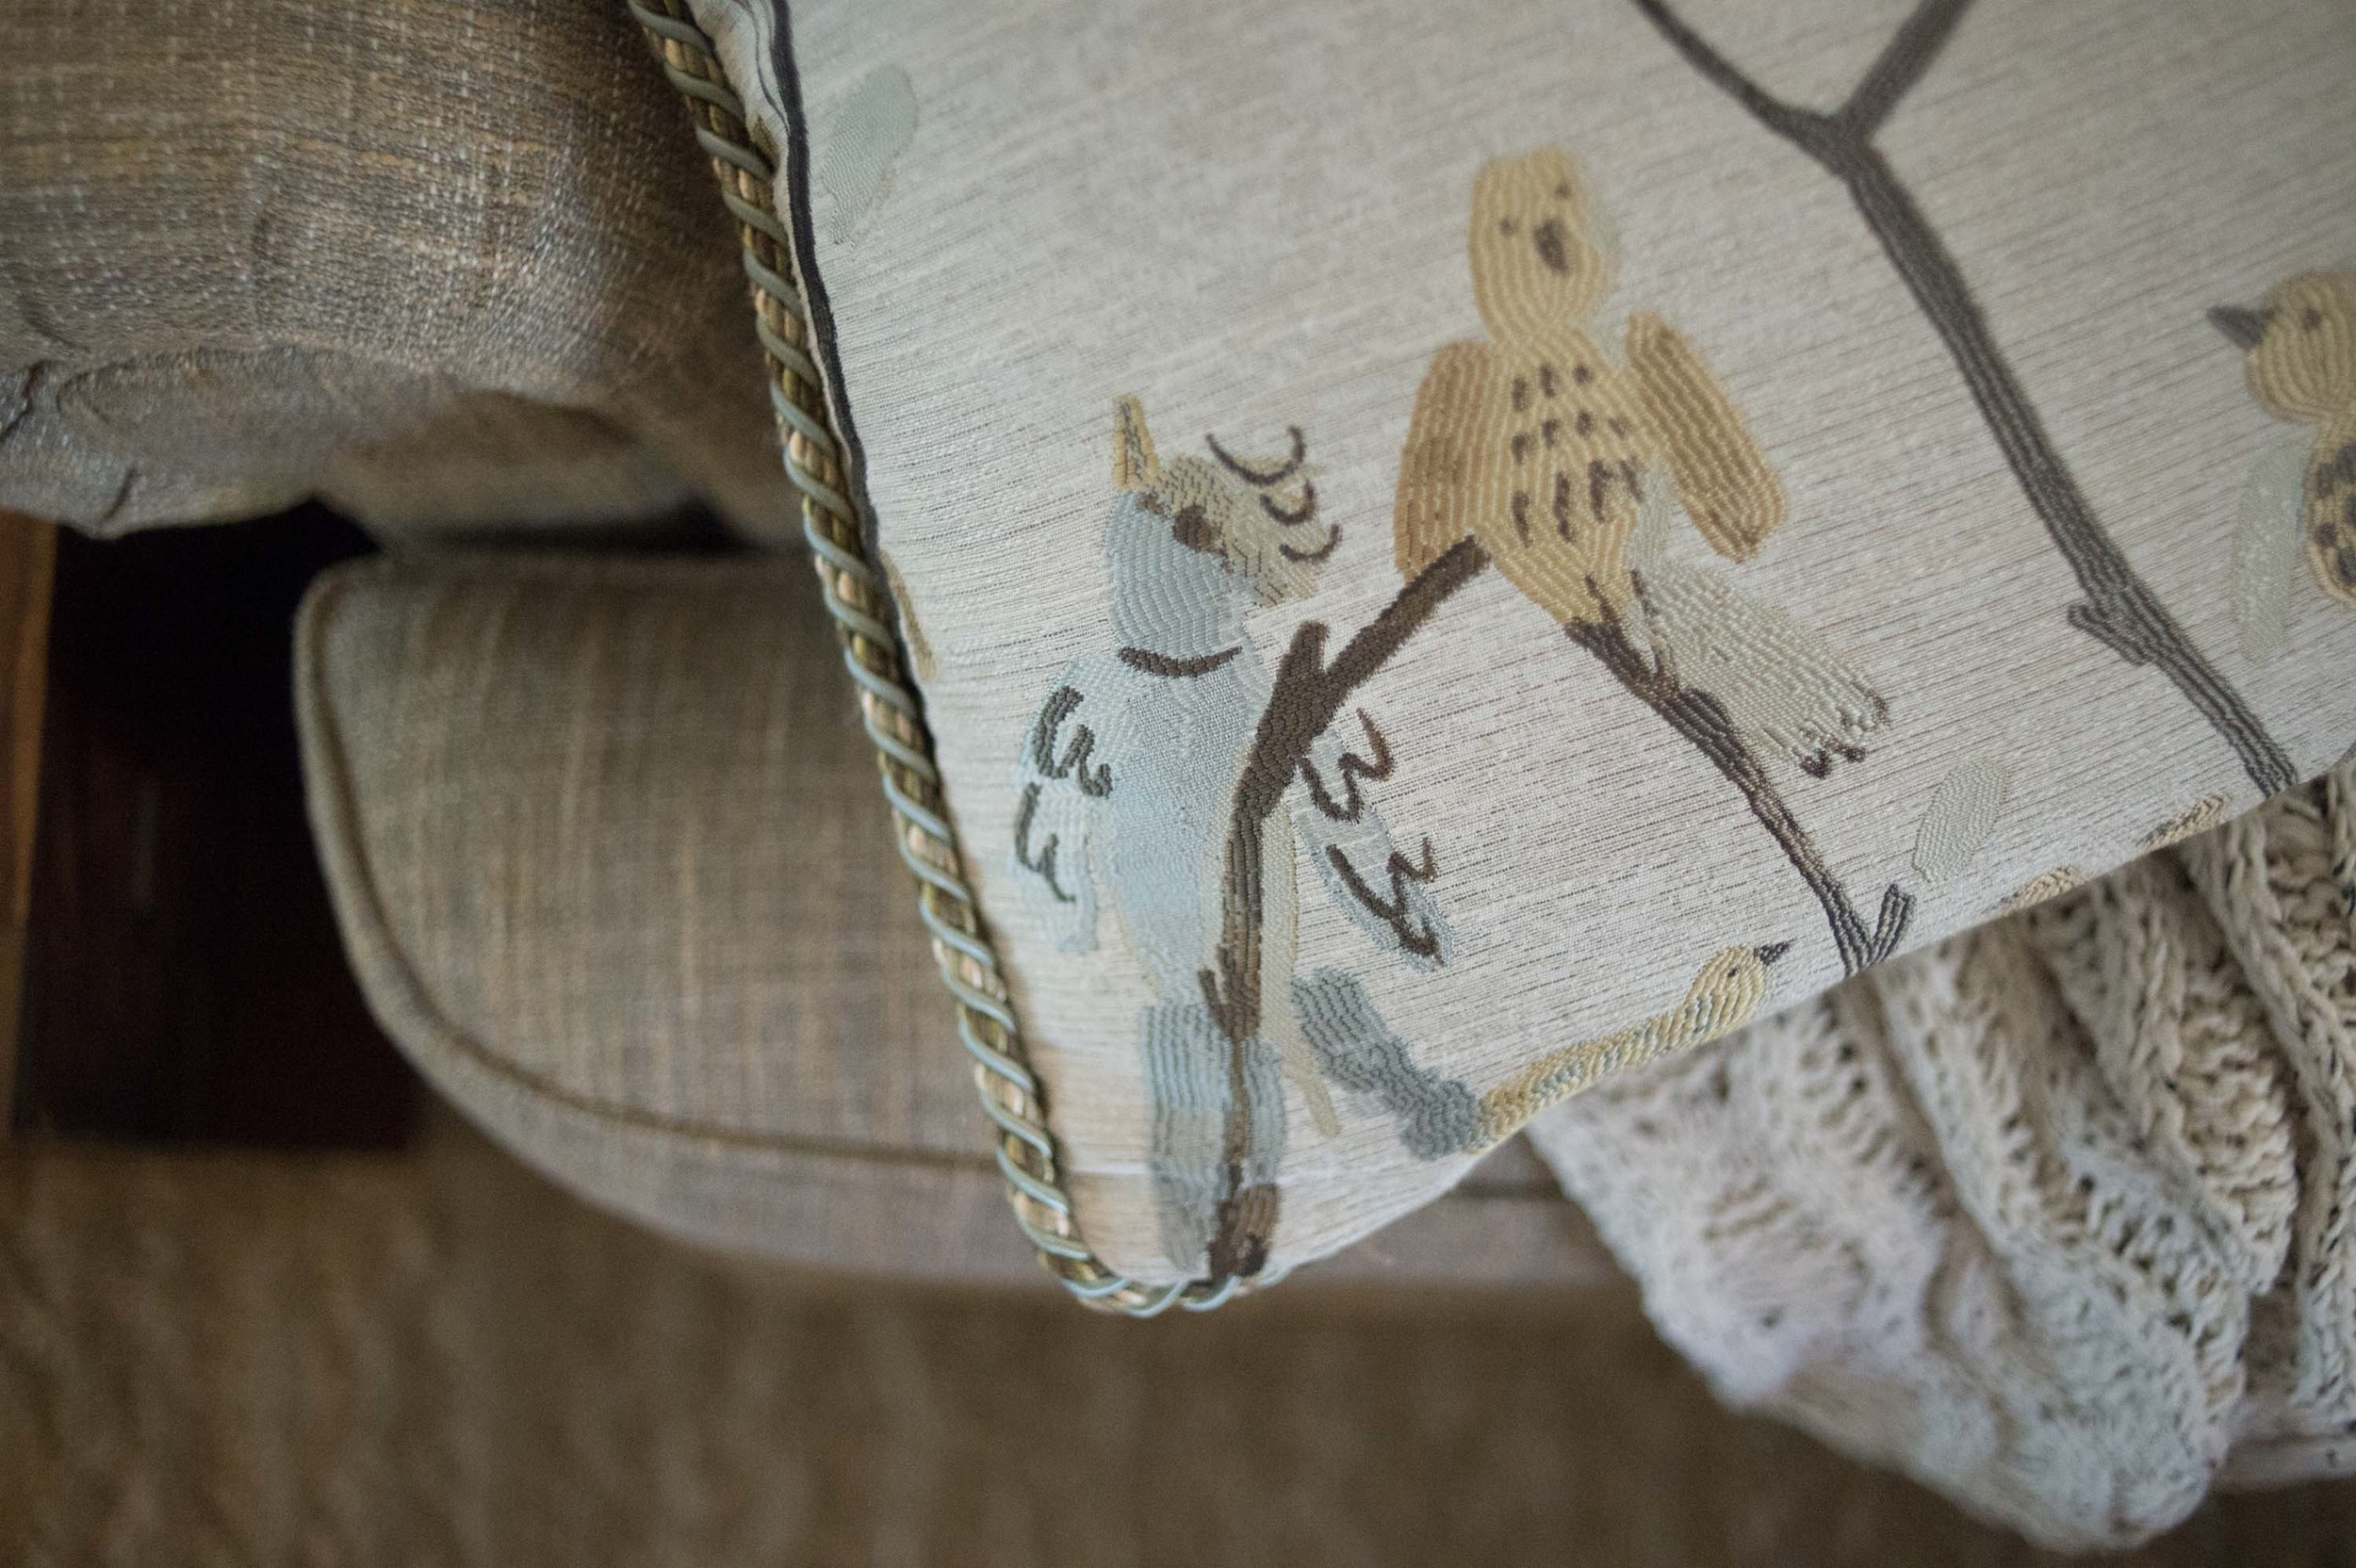 Detailed Shot of Pillow Fabric, Trim & Sofa Fabric